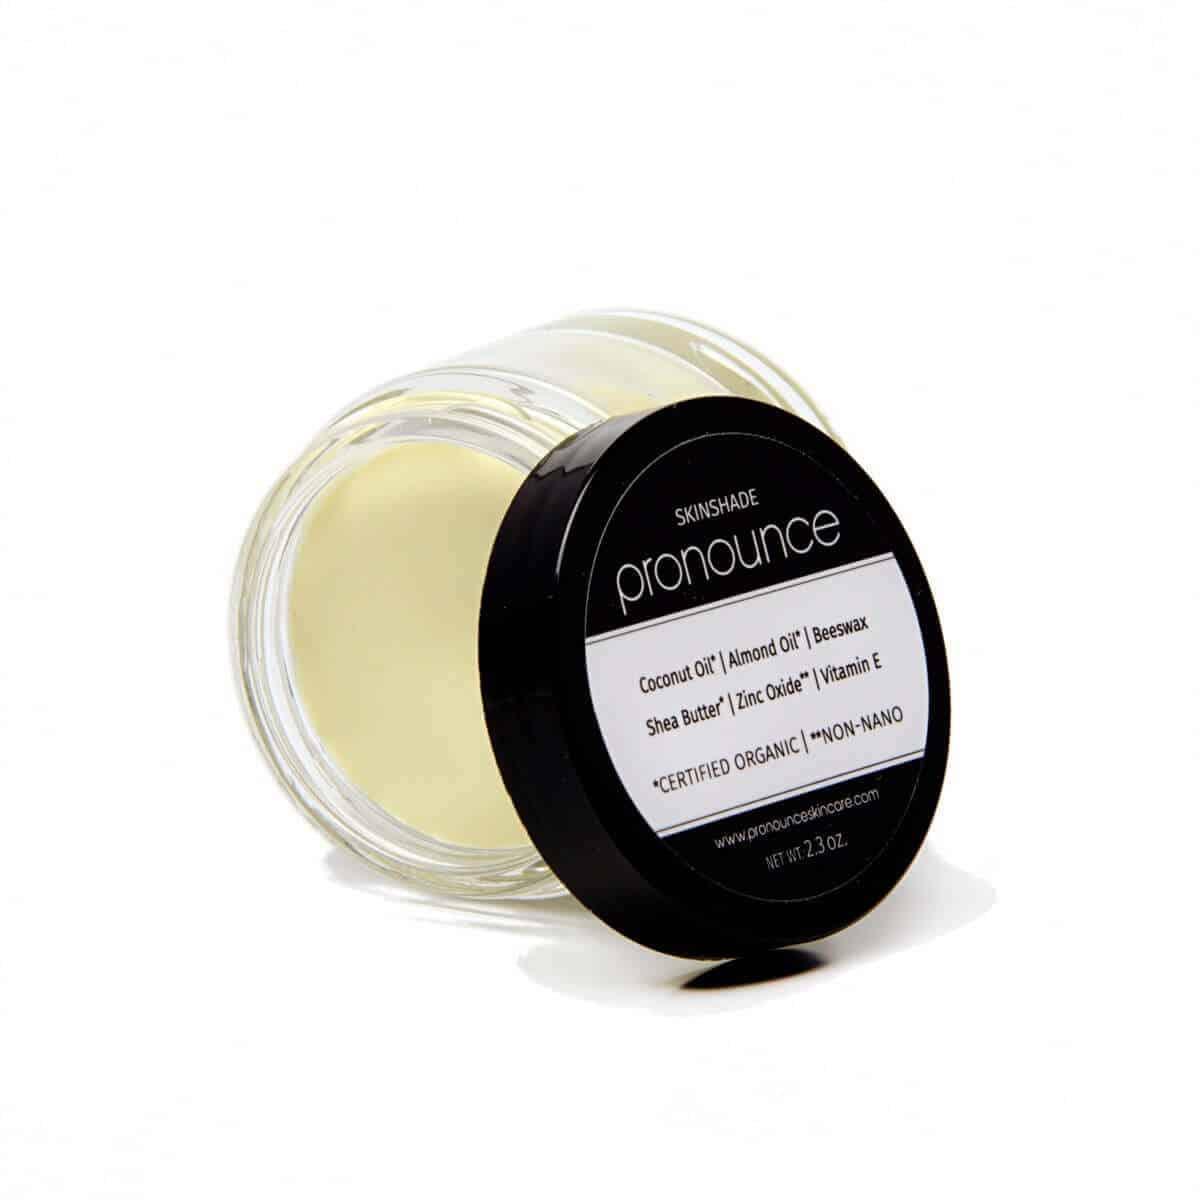 Pronounce Skinshade Zinc Oxide Sunscreen